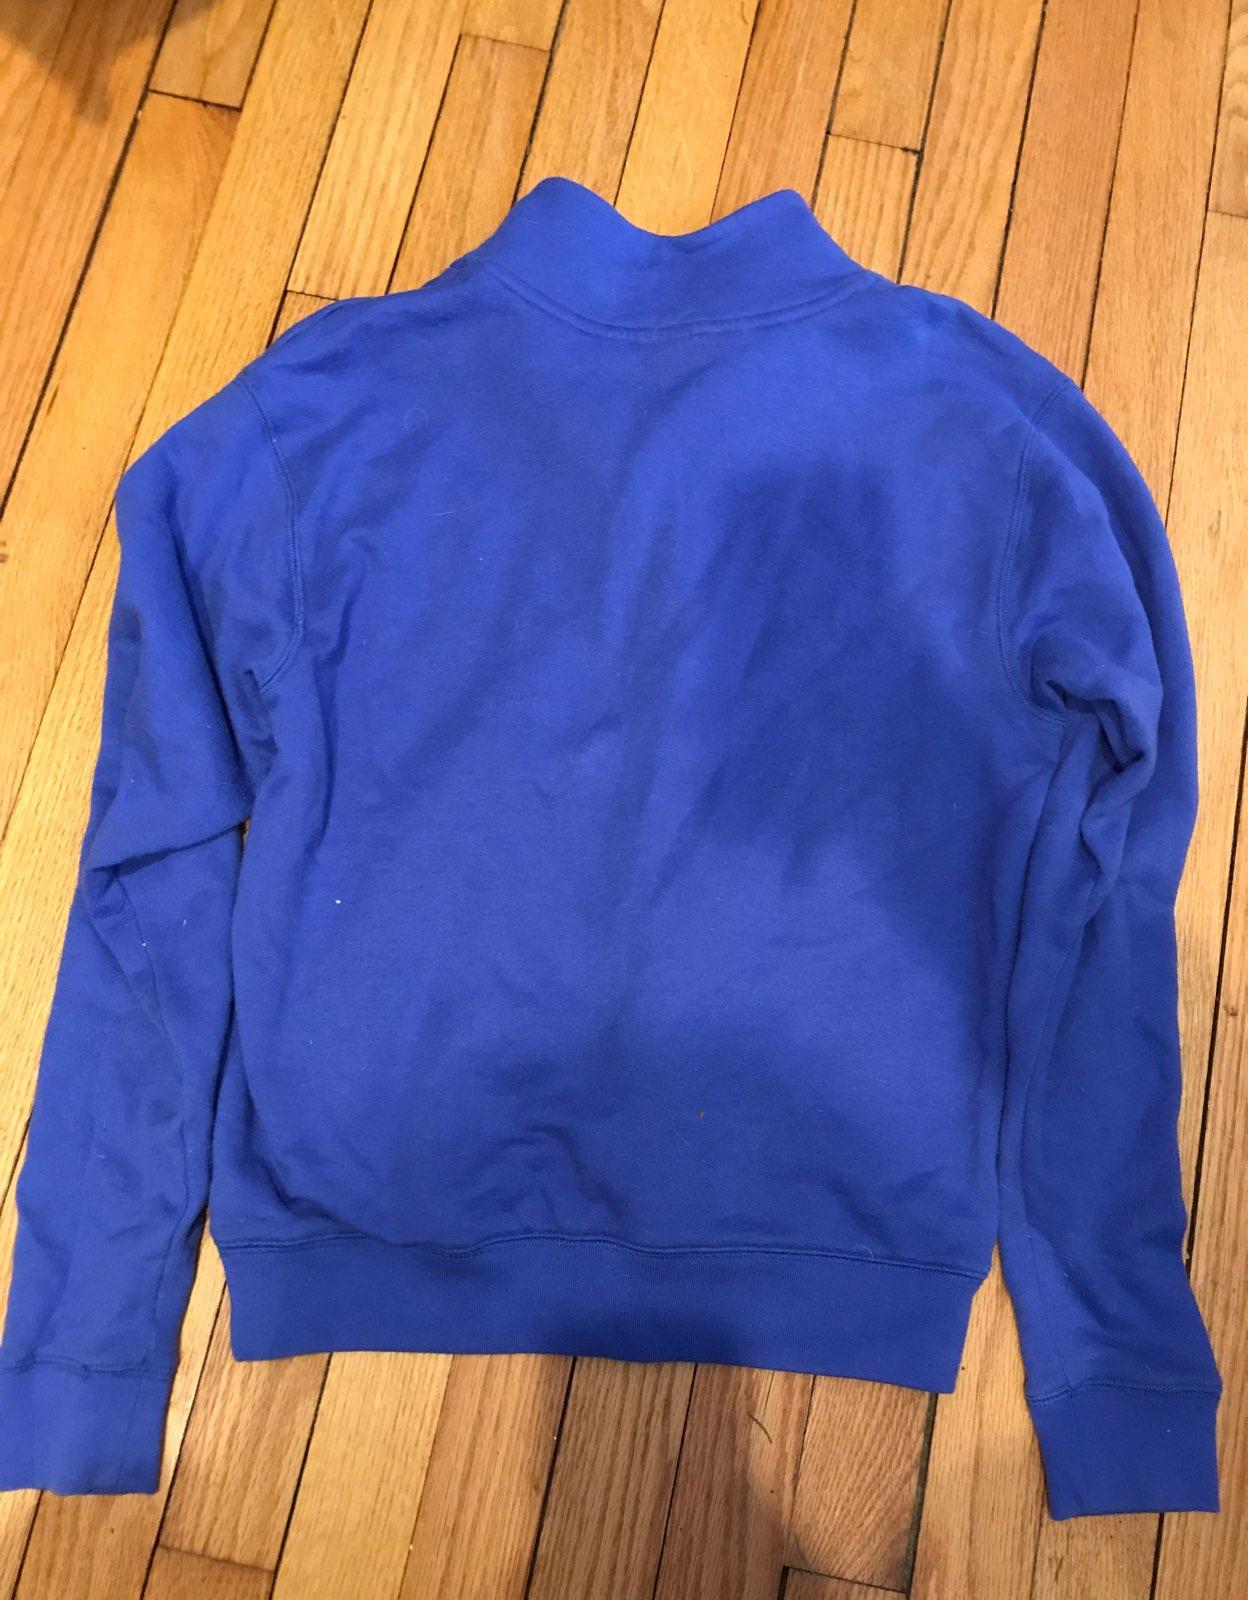 victoria's secret pink sweatshirt - Mercari: BUY & SELL THINGS YOU ...